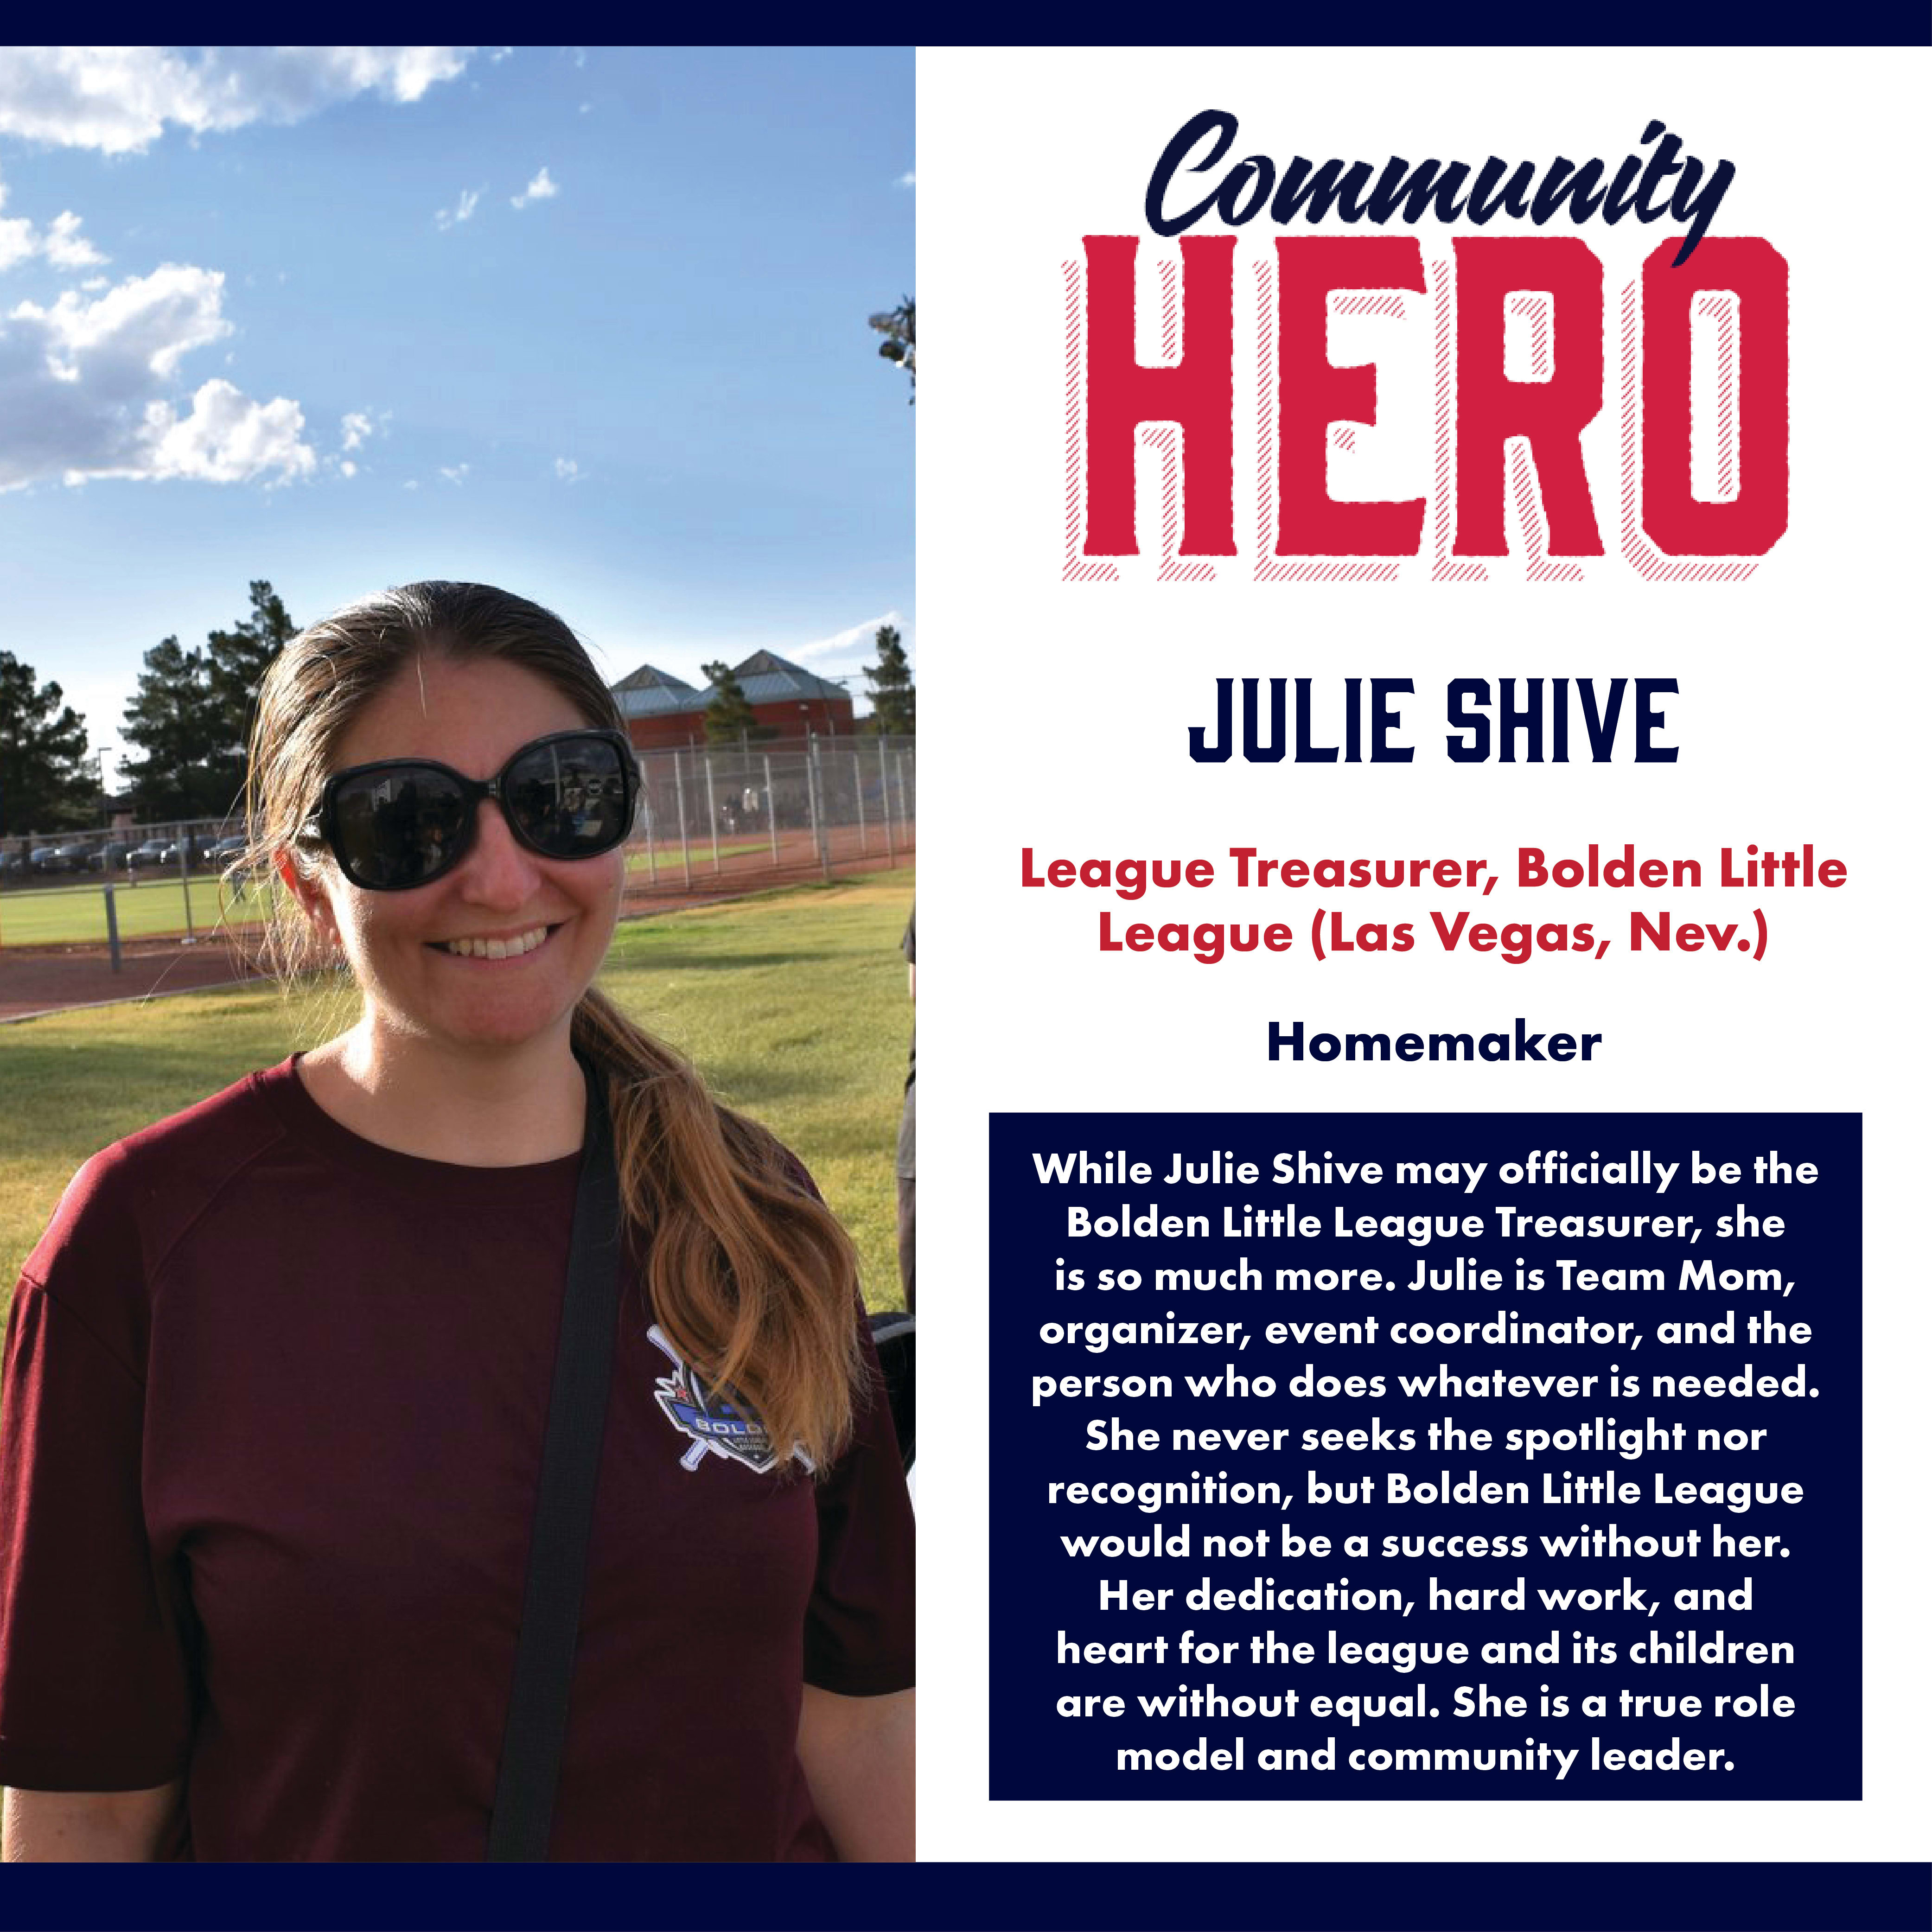 Julie Shive